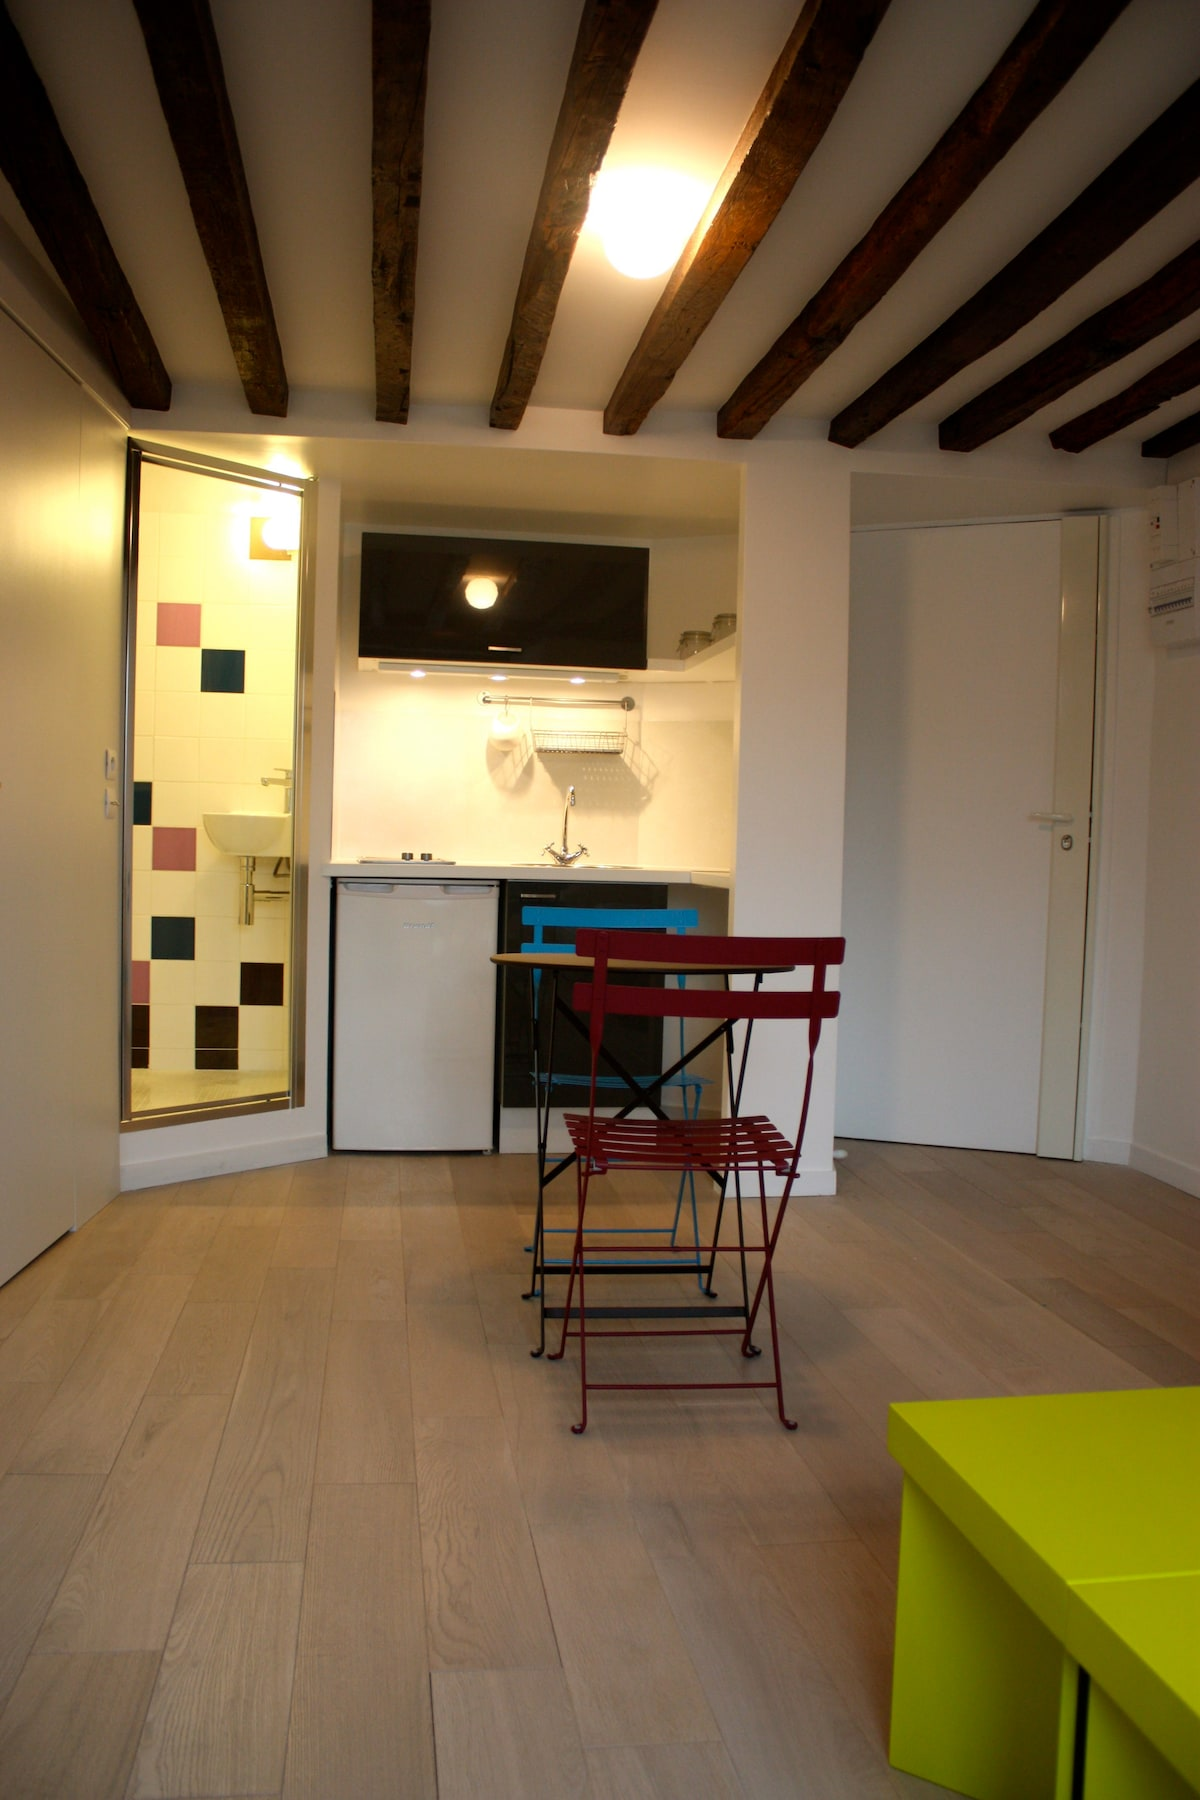 StudioBrady at the heart of Paris